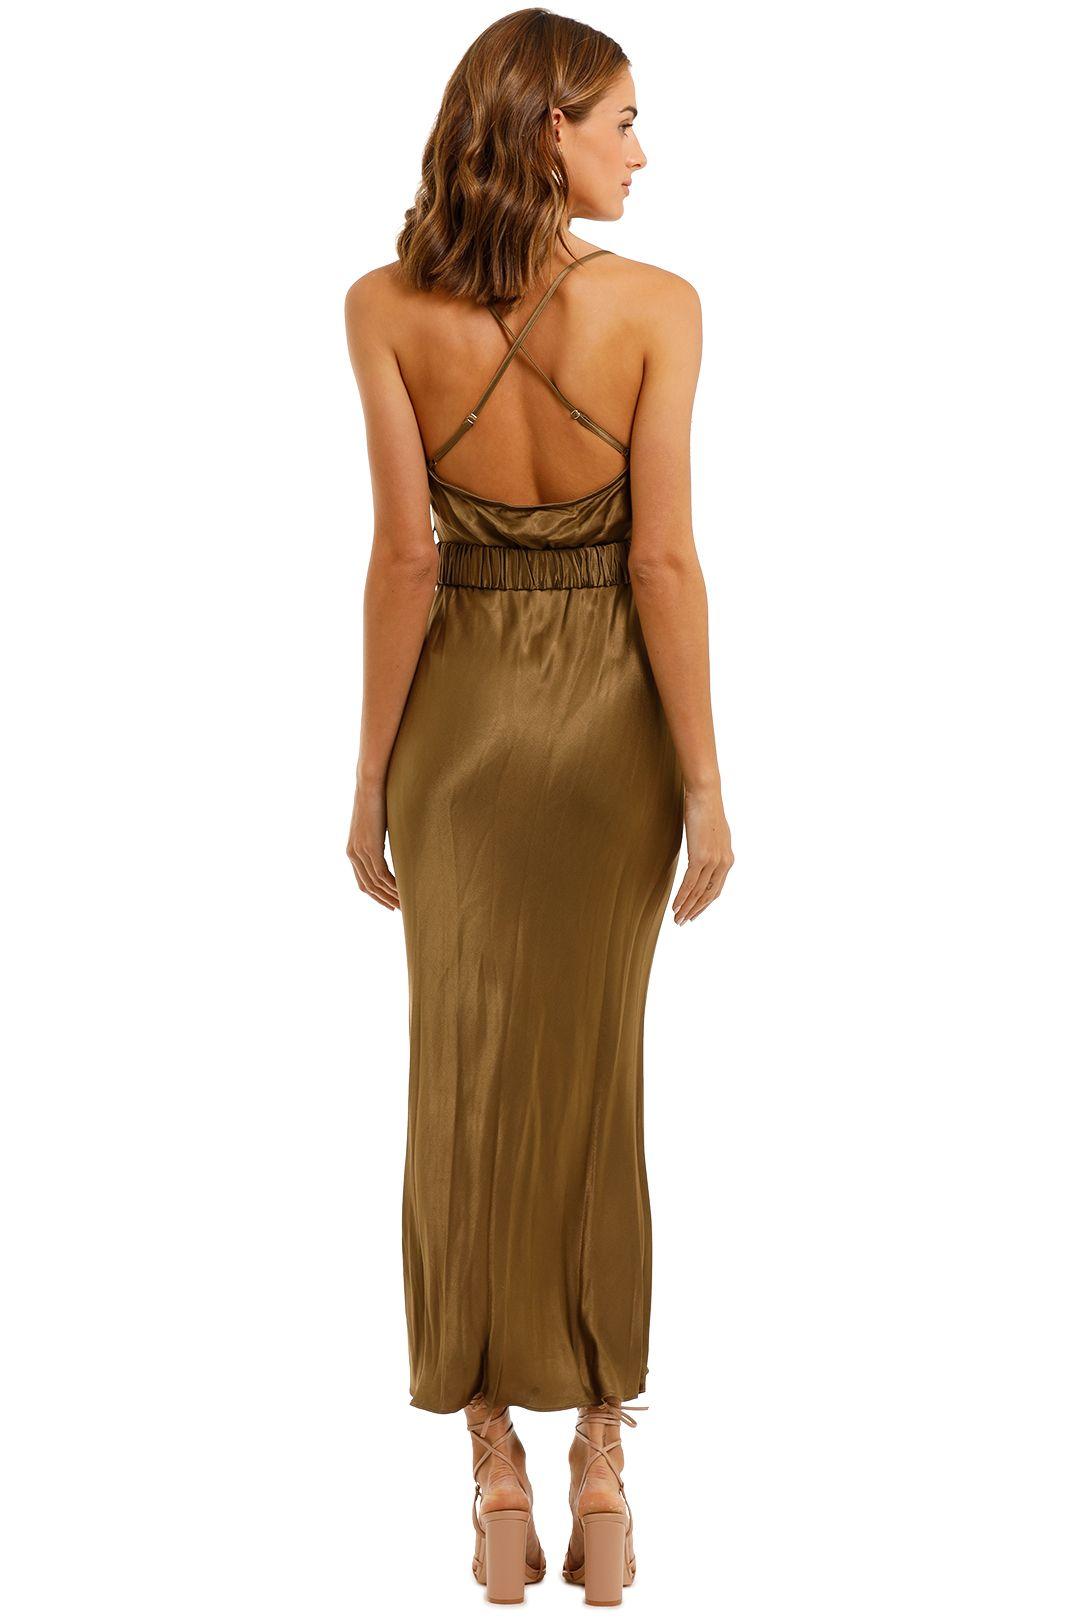 Shona Joy Gala Bias Midi Dress Olive Slip